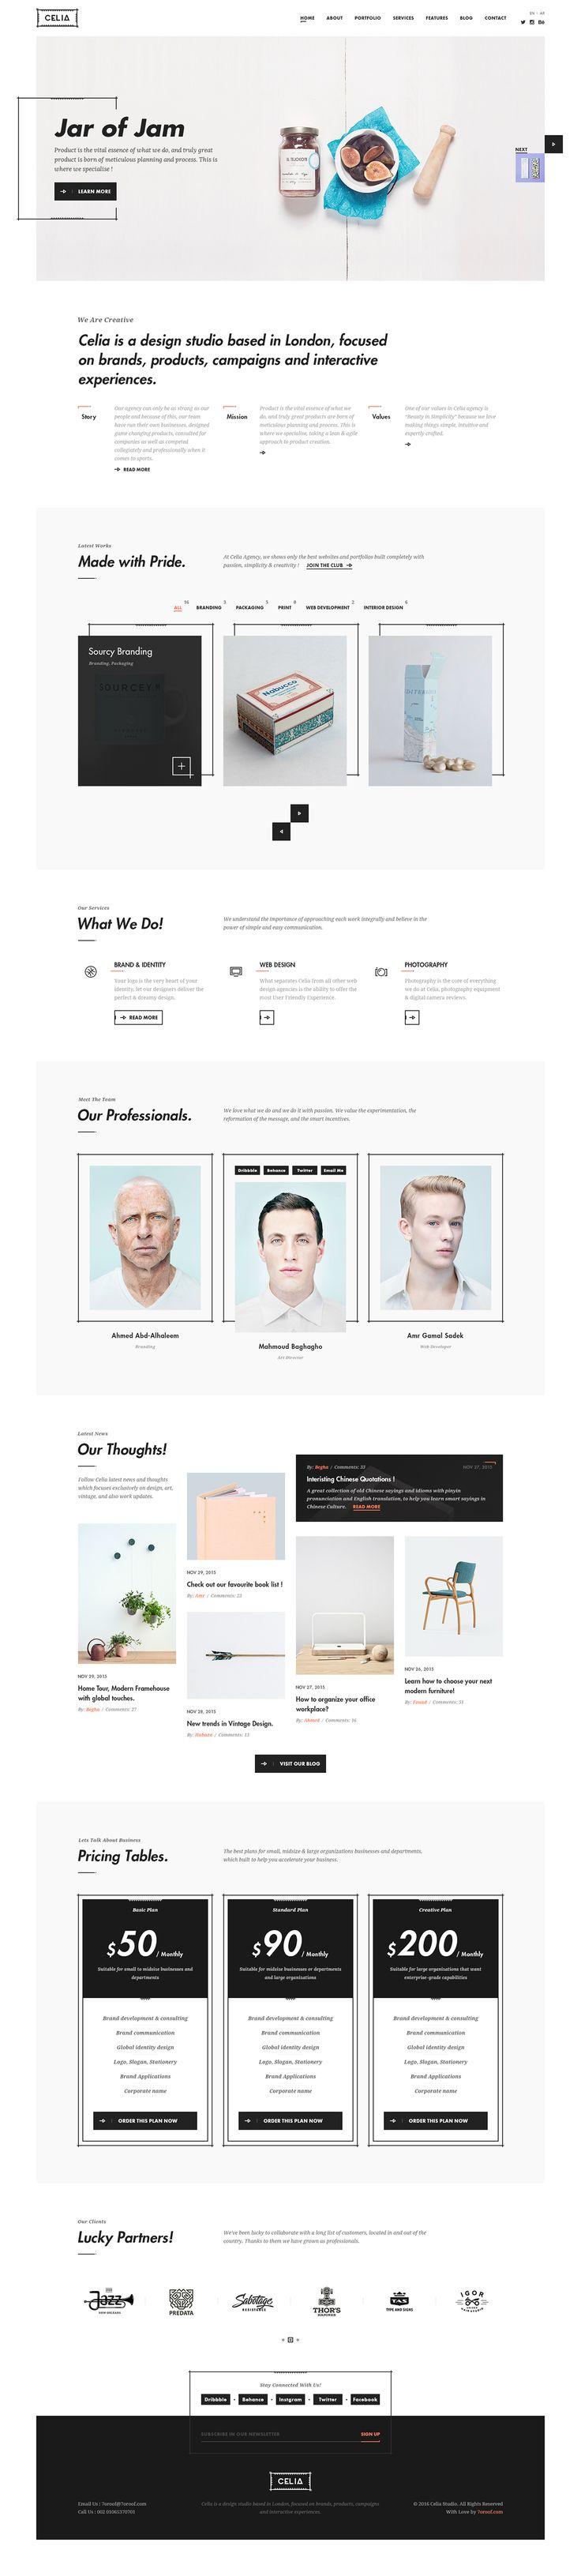 Behance :: Celia - Creative PSD Template by Mahmoud Baghagho